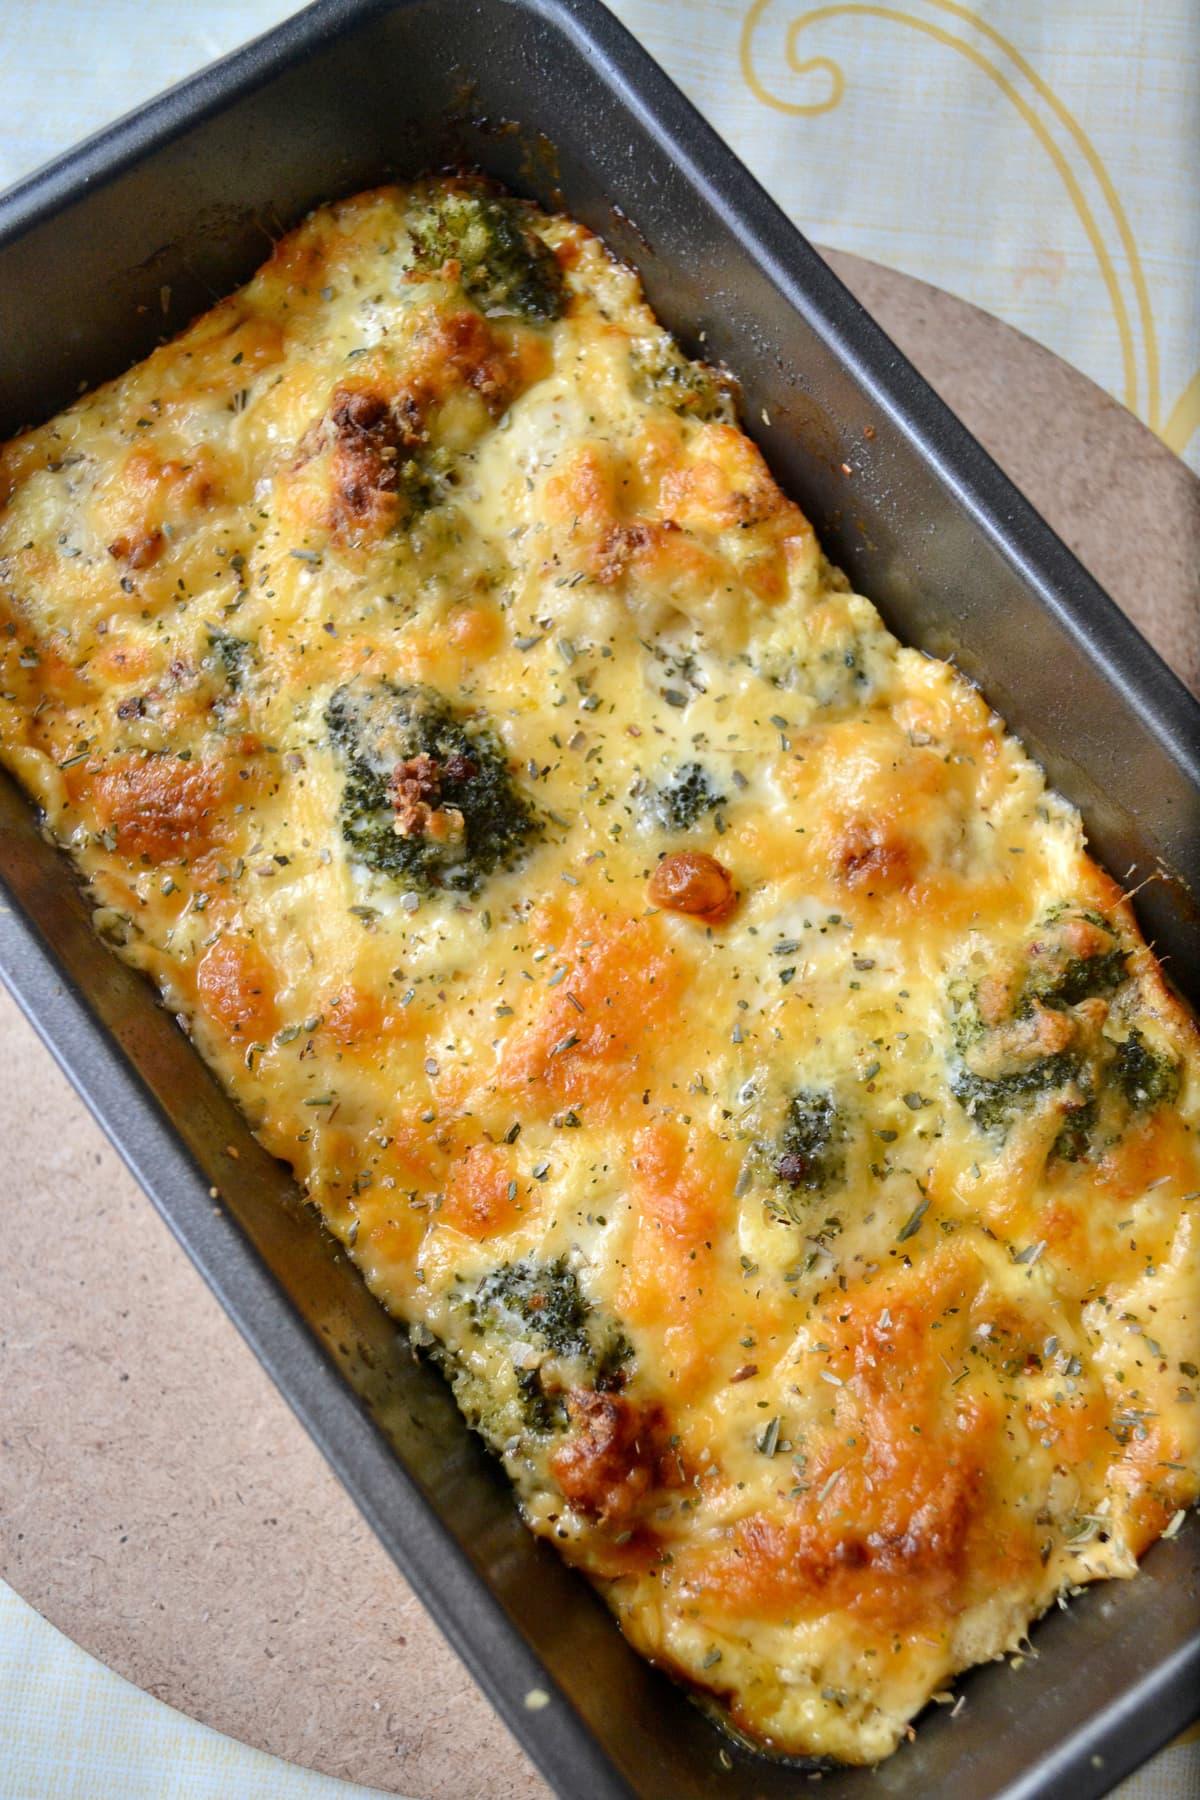 Freshly baked cheesy broccoli cauliflower bake